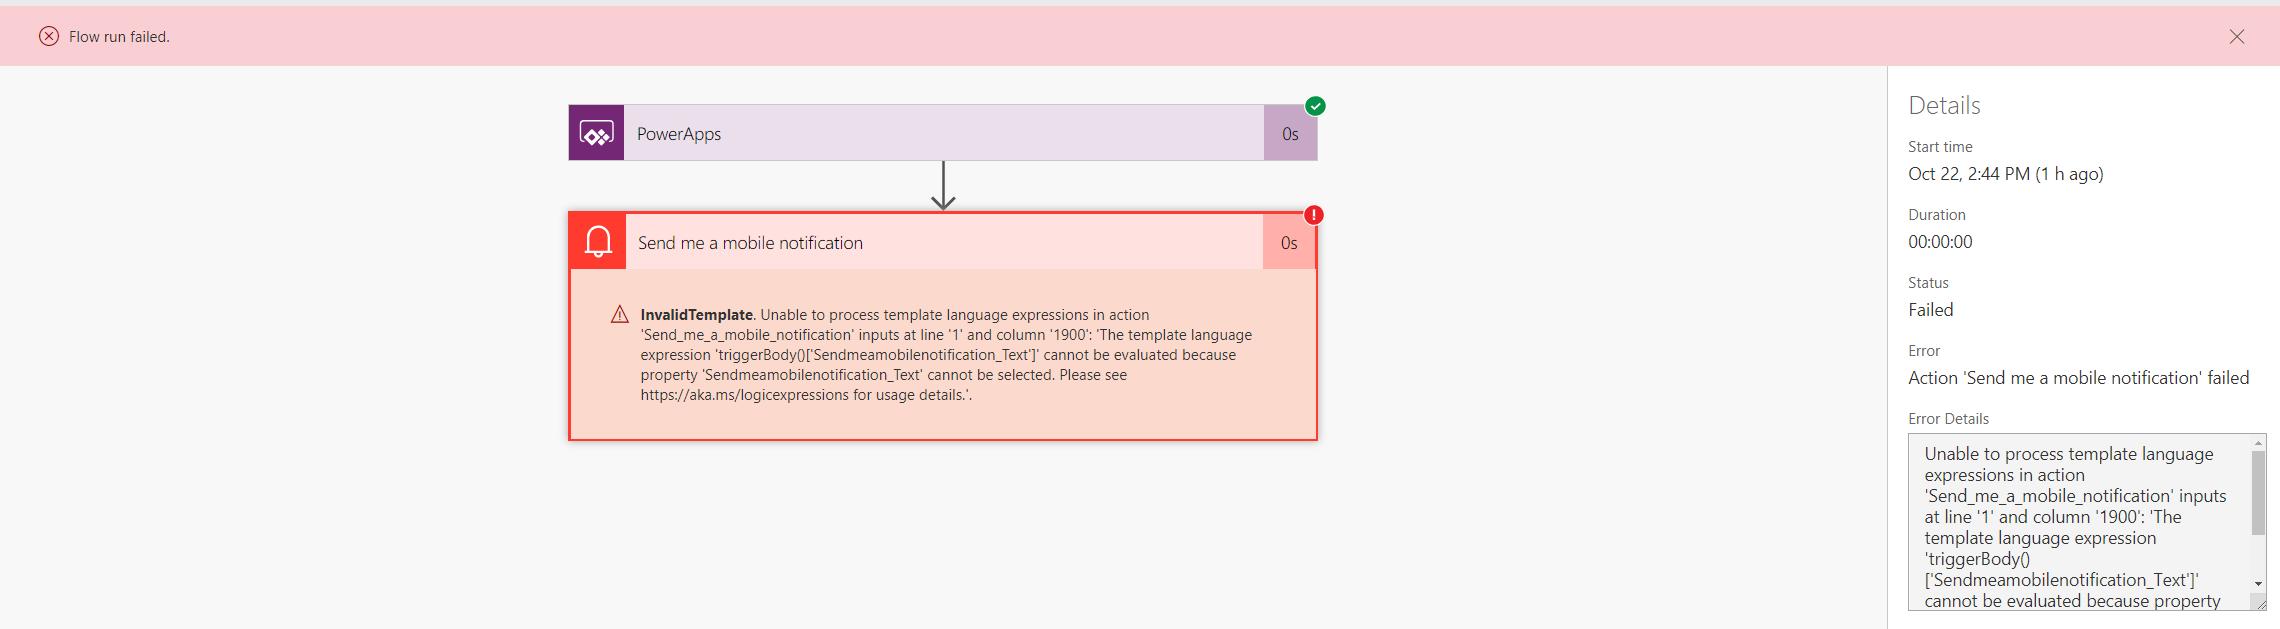 Flow missing input error